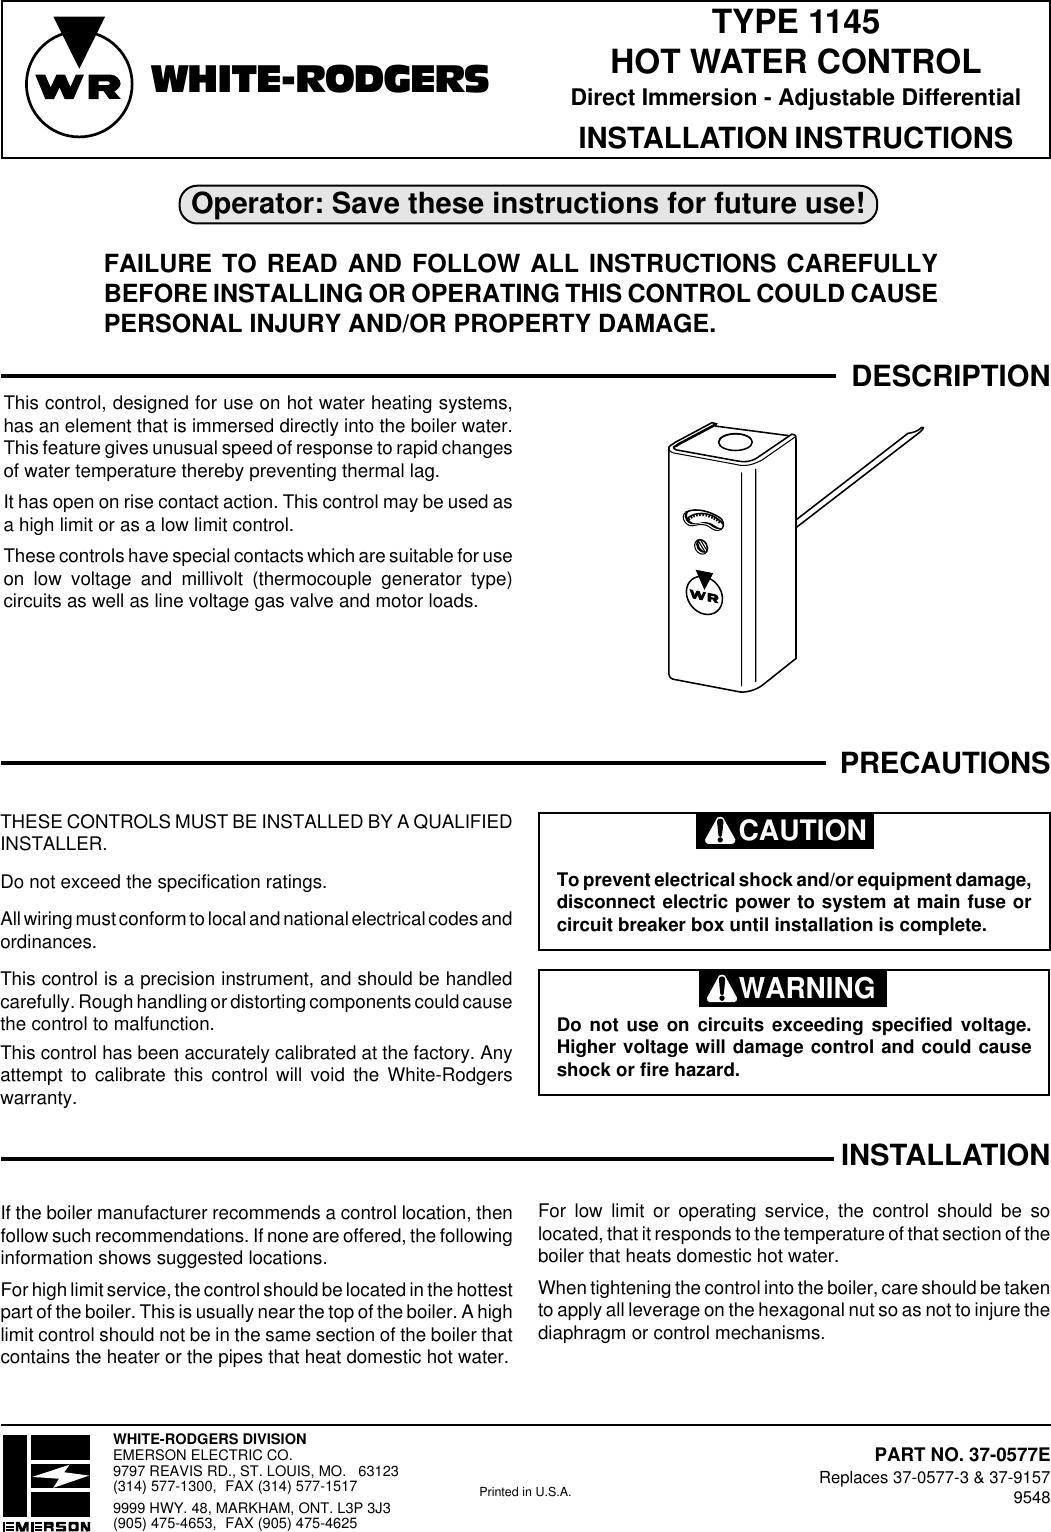 mueller climatrol parts rh homesecurity press on Climatrol Furnace for climatrol  wiring diagram #32 at